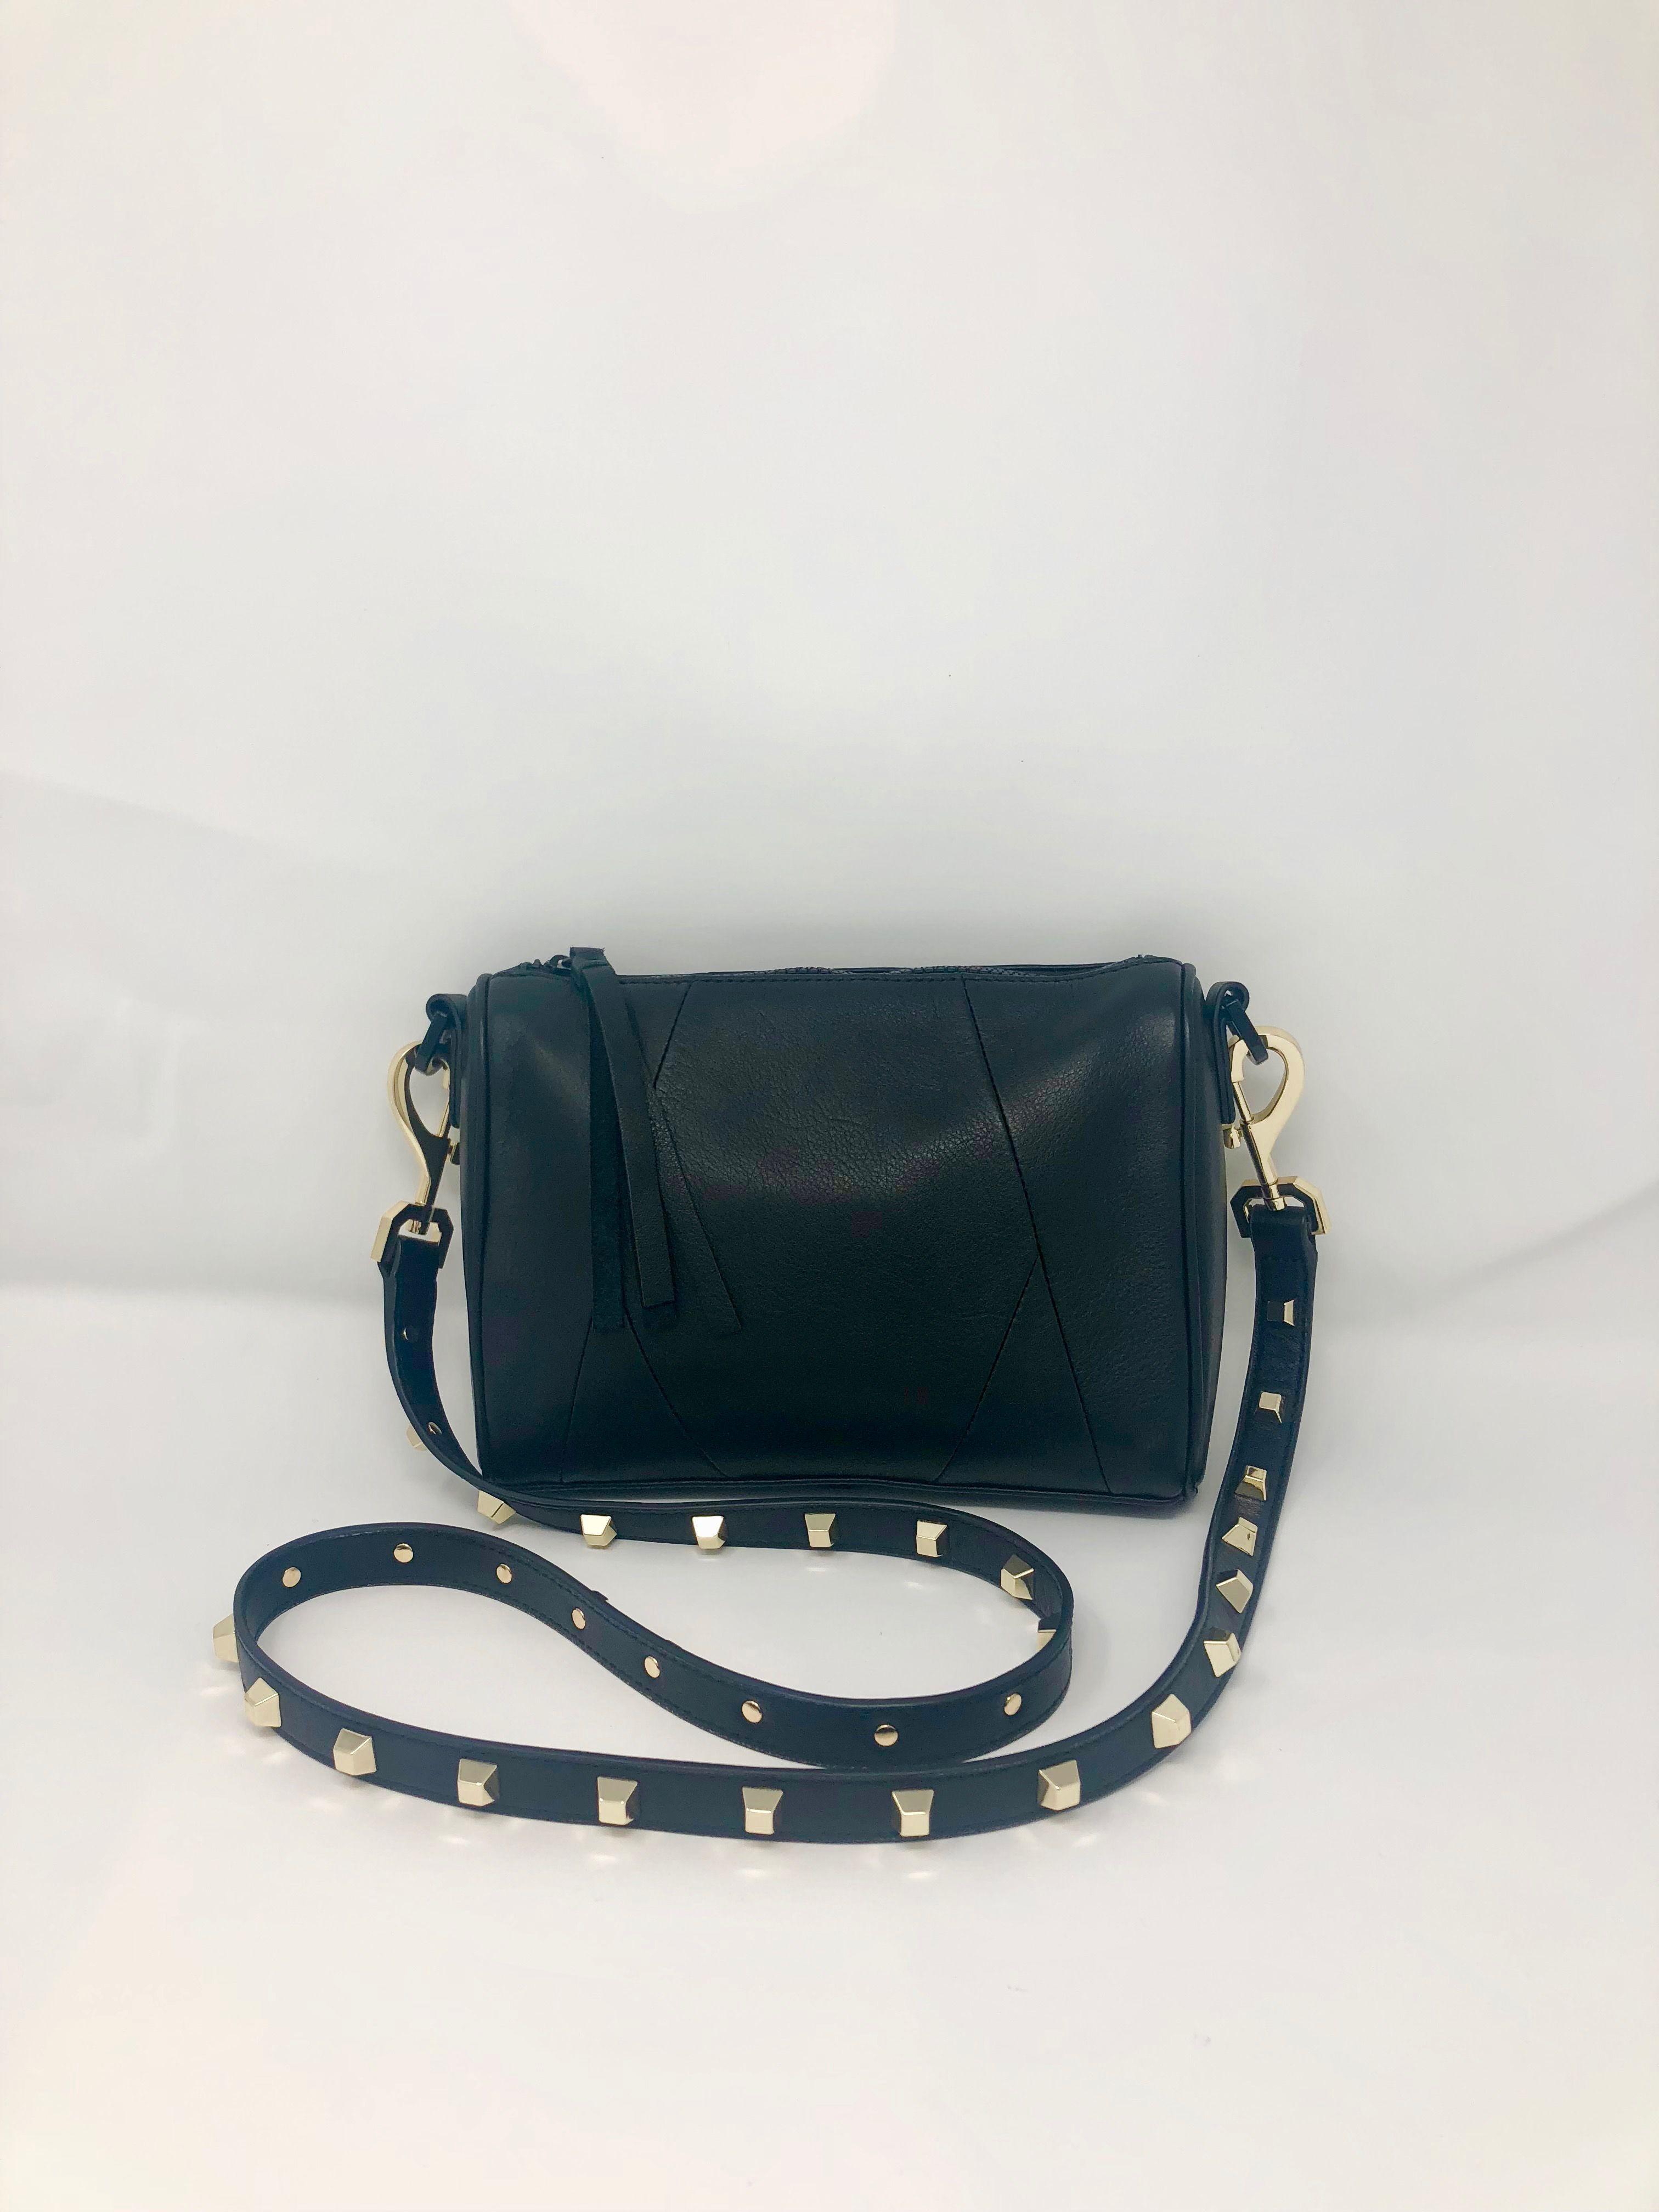 f8d2762d07 Buy buttery leather handbags for women online. Bolsa Nova Handbags Chrissy  Crossbody with studded straps  bolsanovahandbags  handbags  bags  bag   handbags   ...